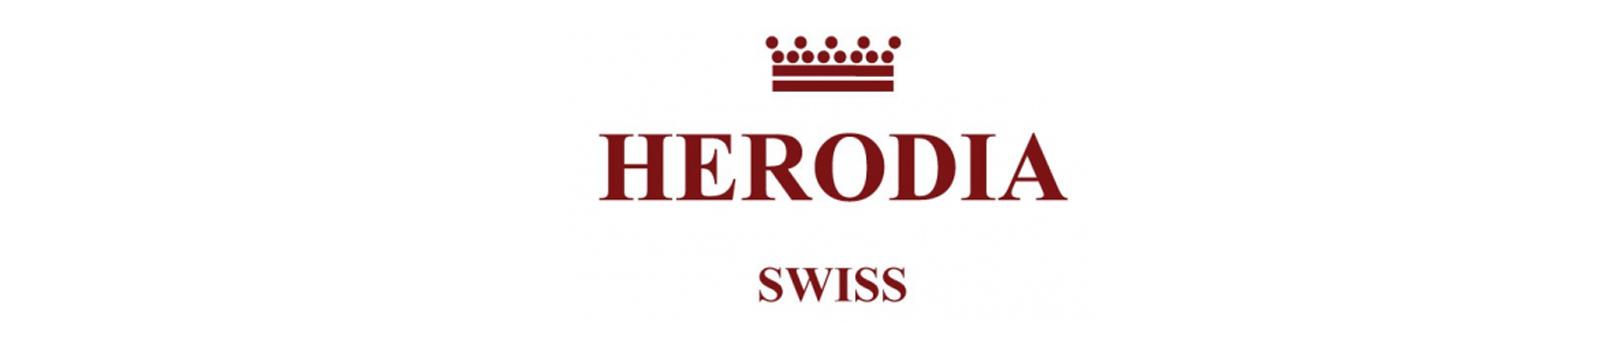 Herodia